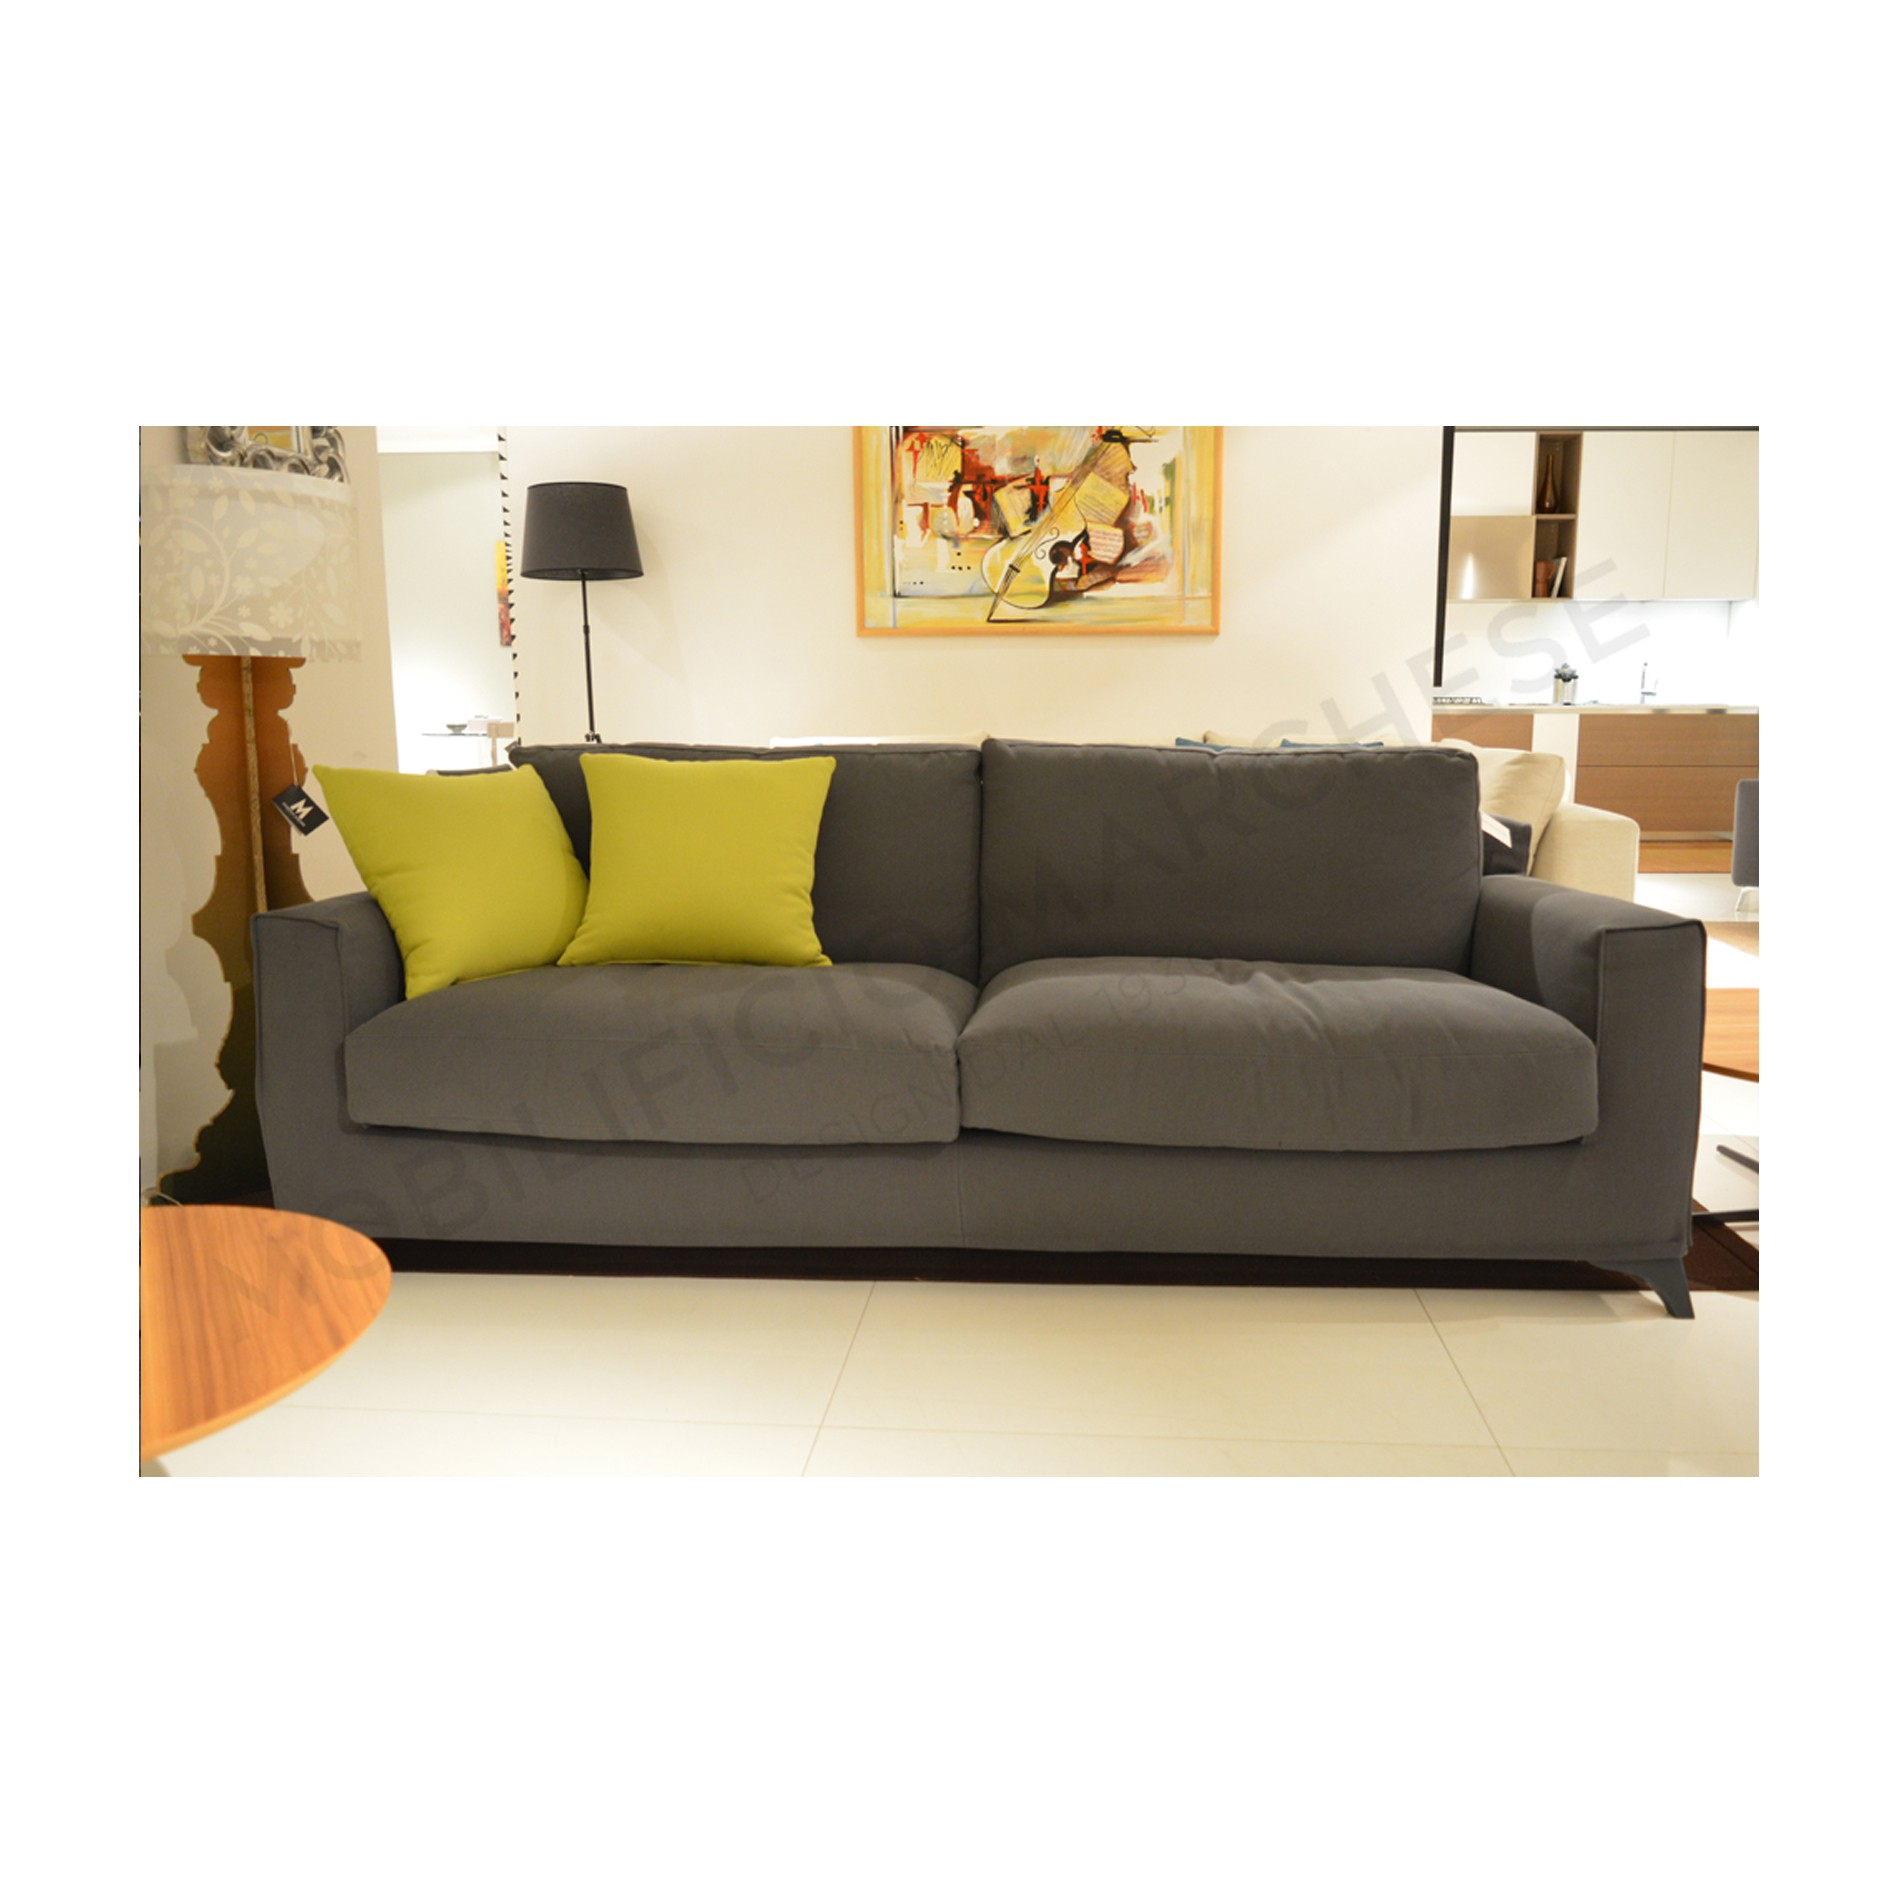 Mr Floyd sofa by Bodema Mobilificio Marchese